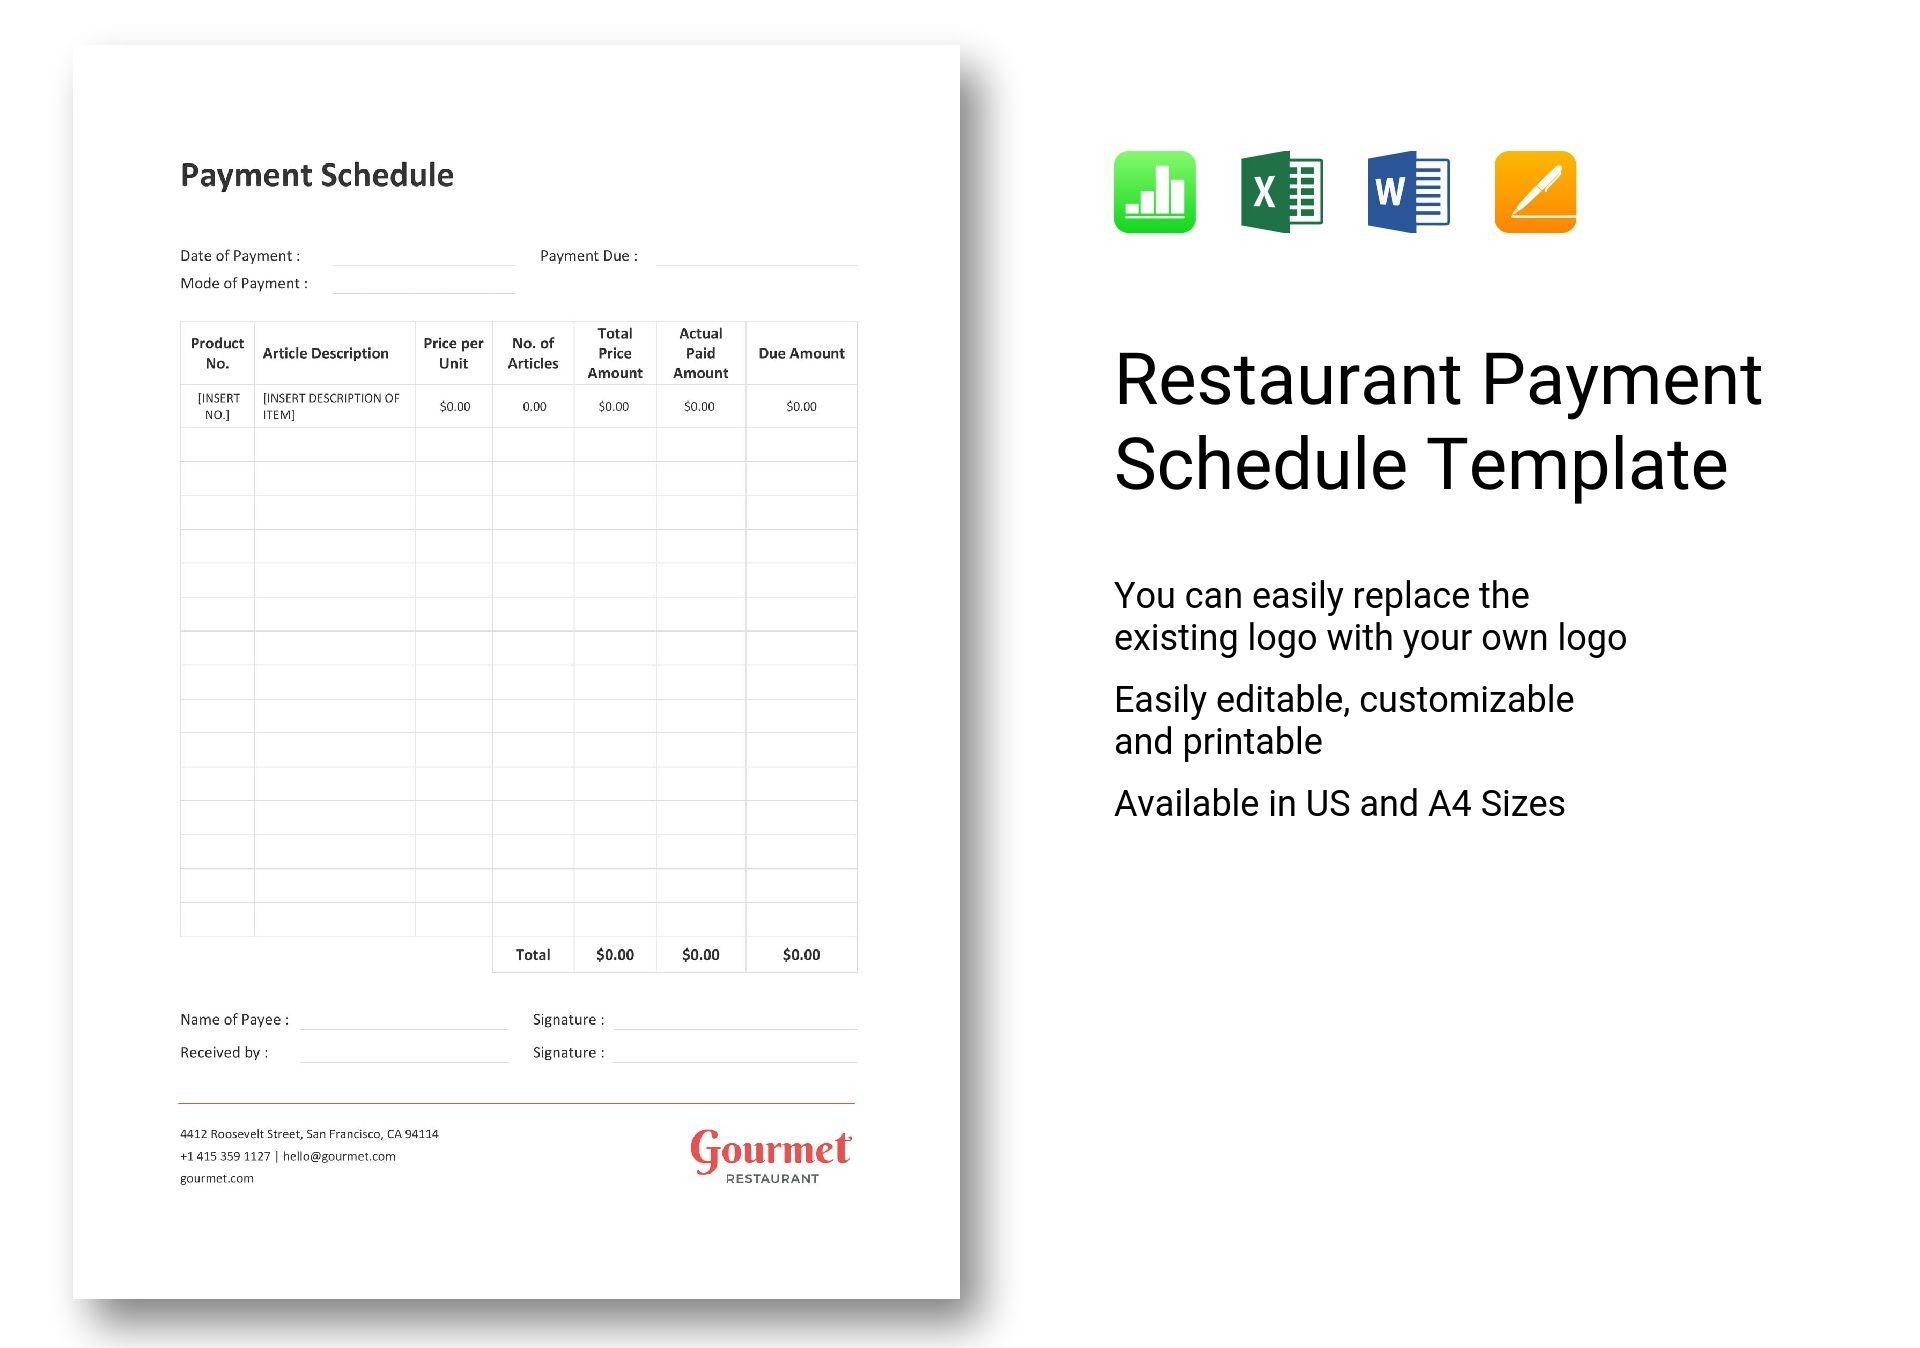 Restaurant Payment Schedule